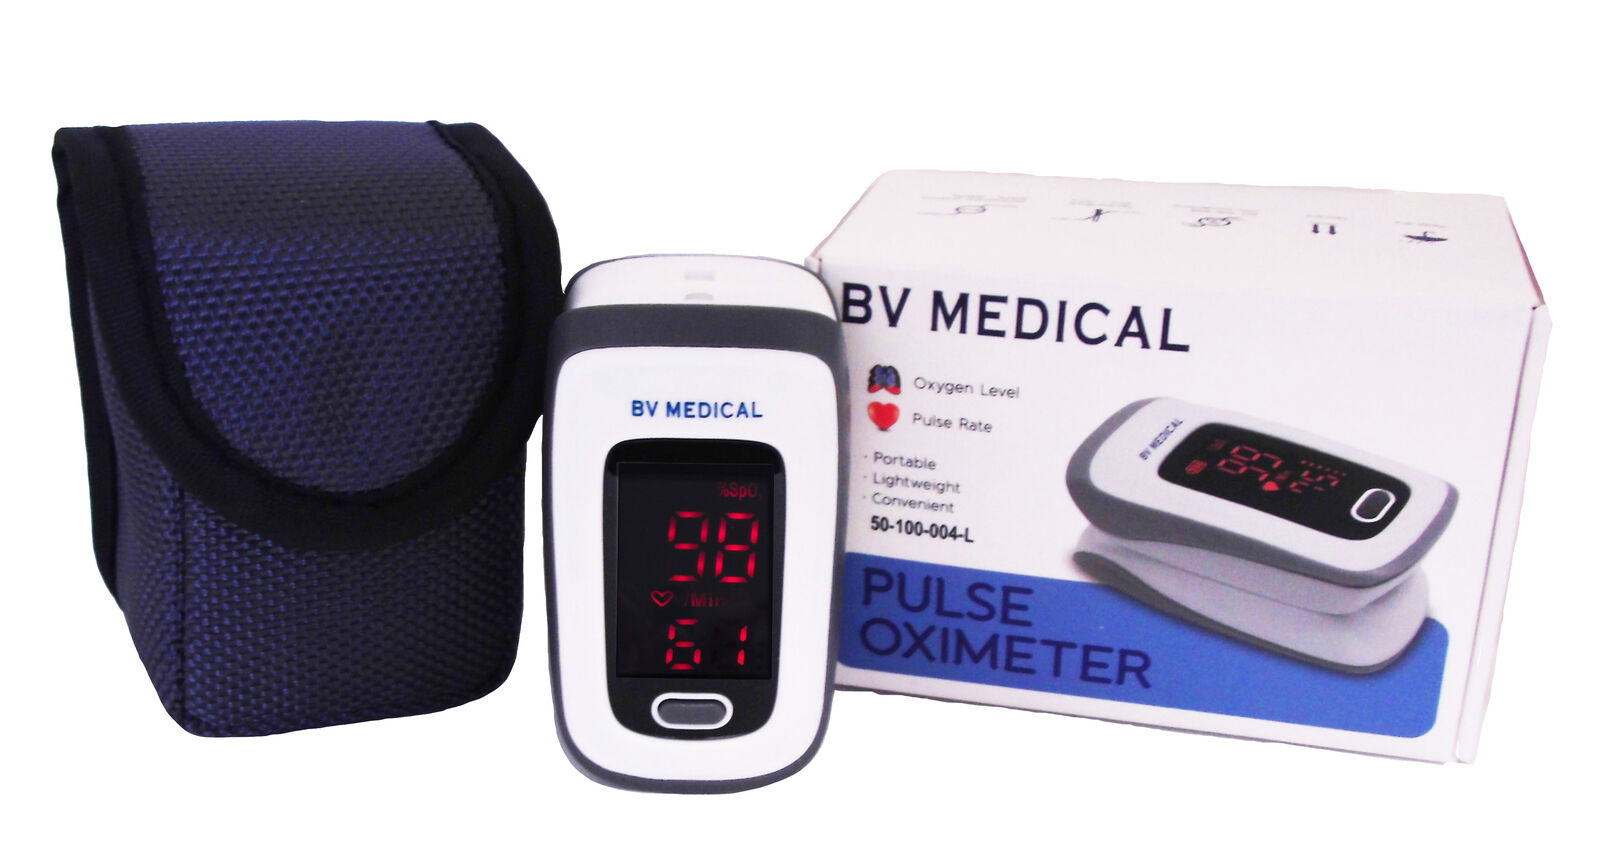 Medical Products 4U